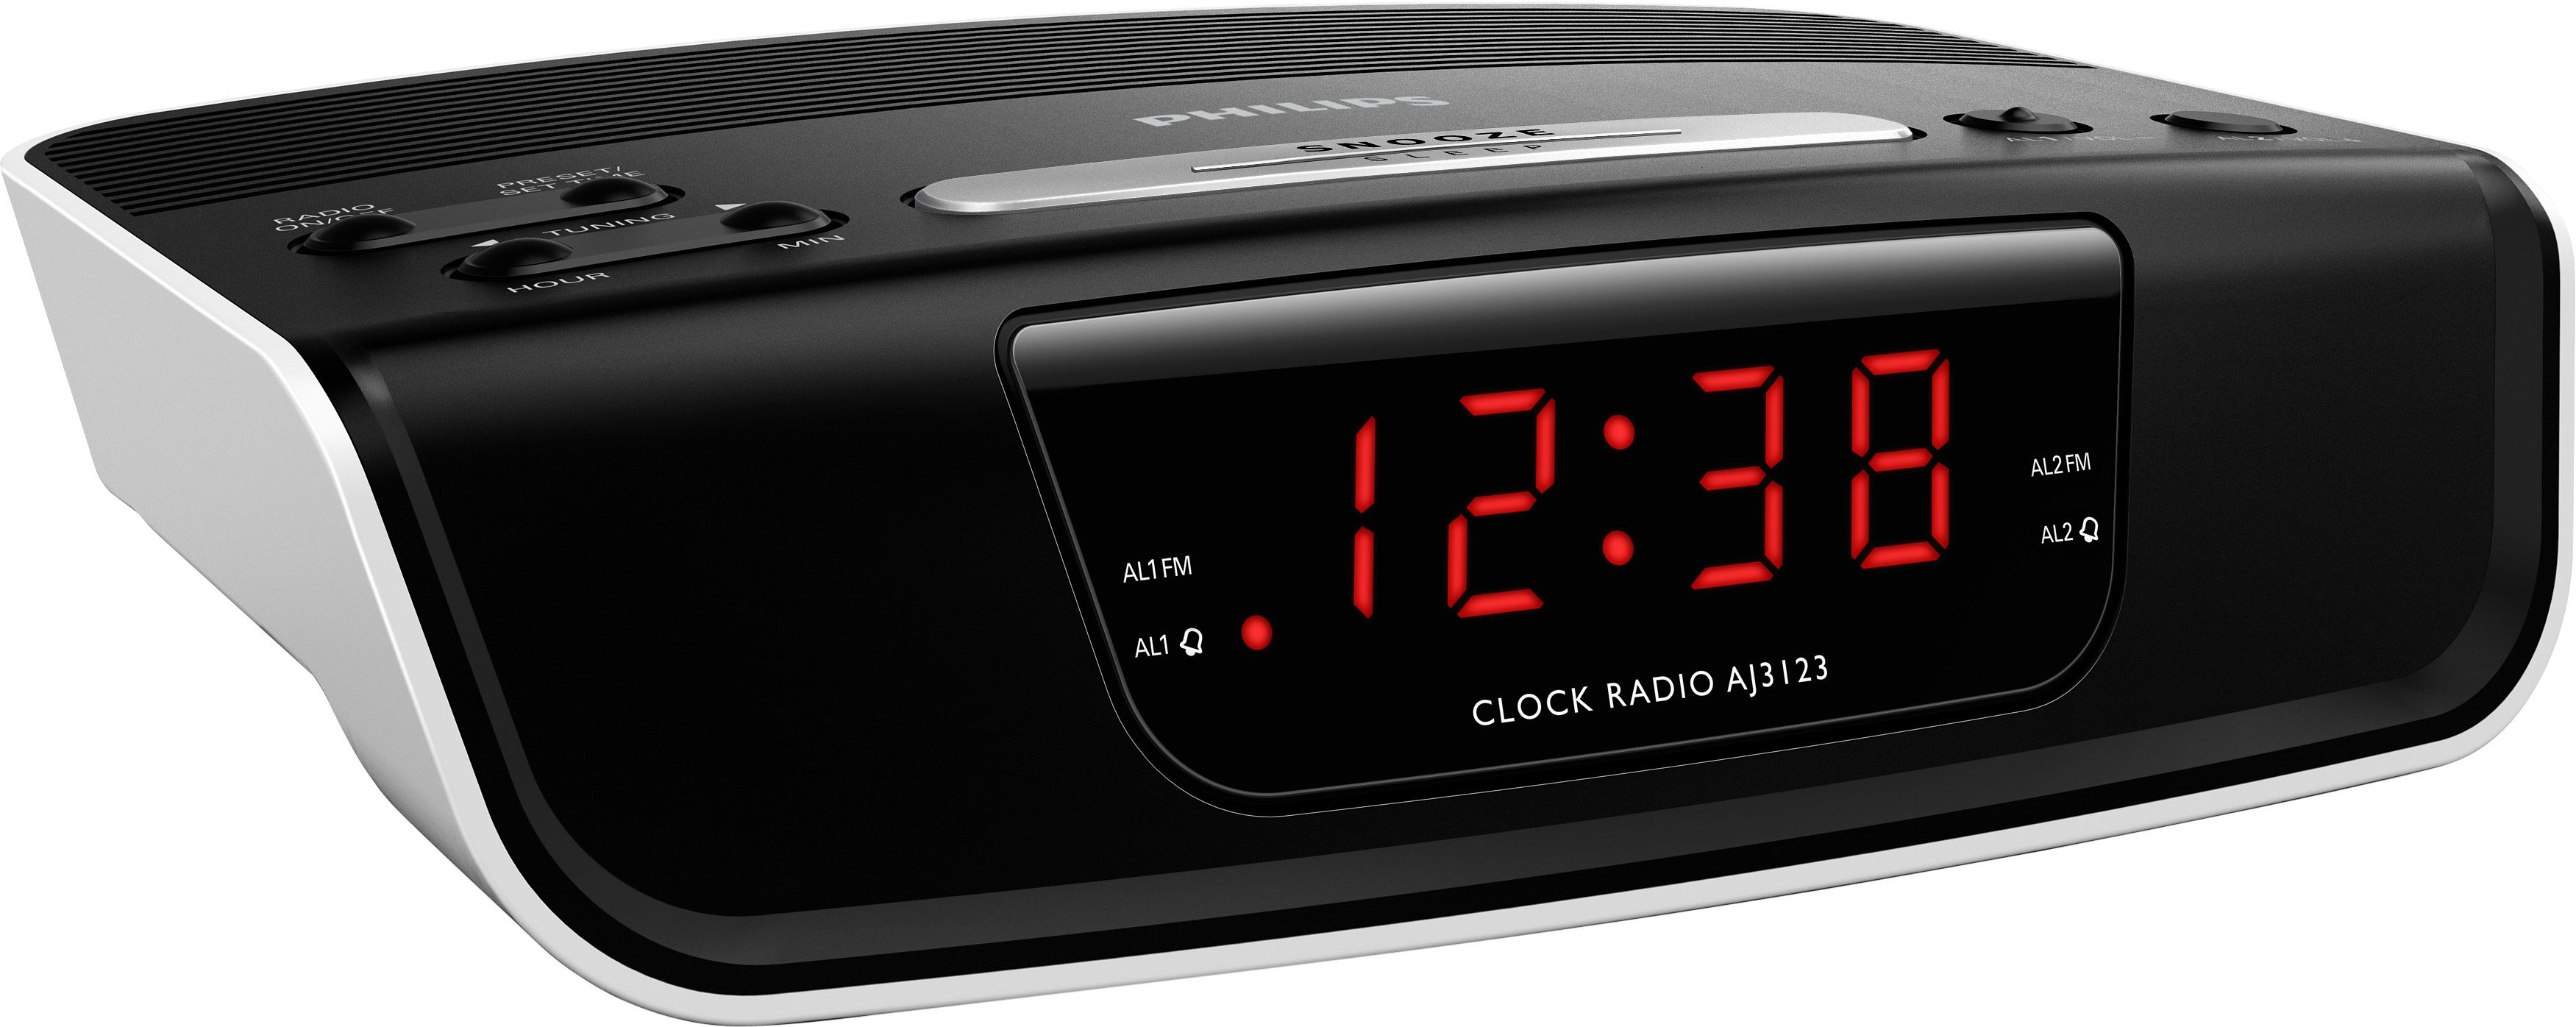 Philips AJ3123 Radiowecker